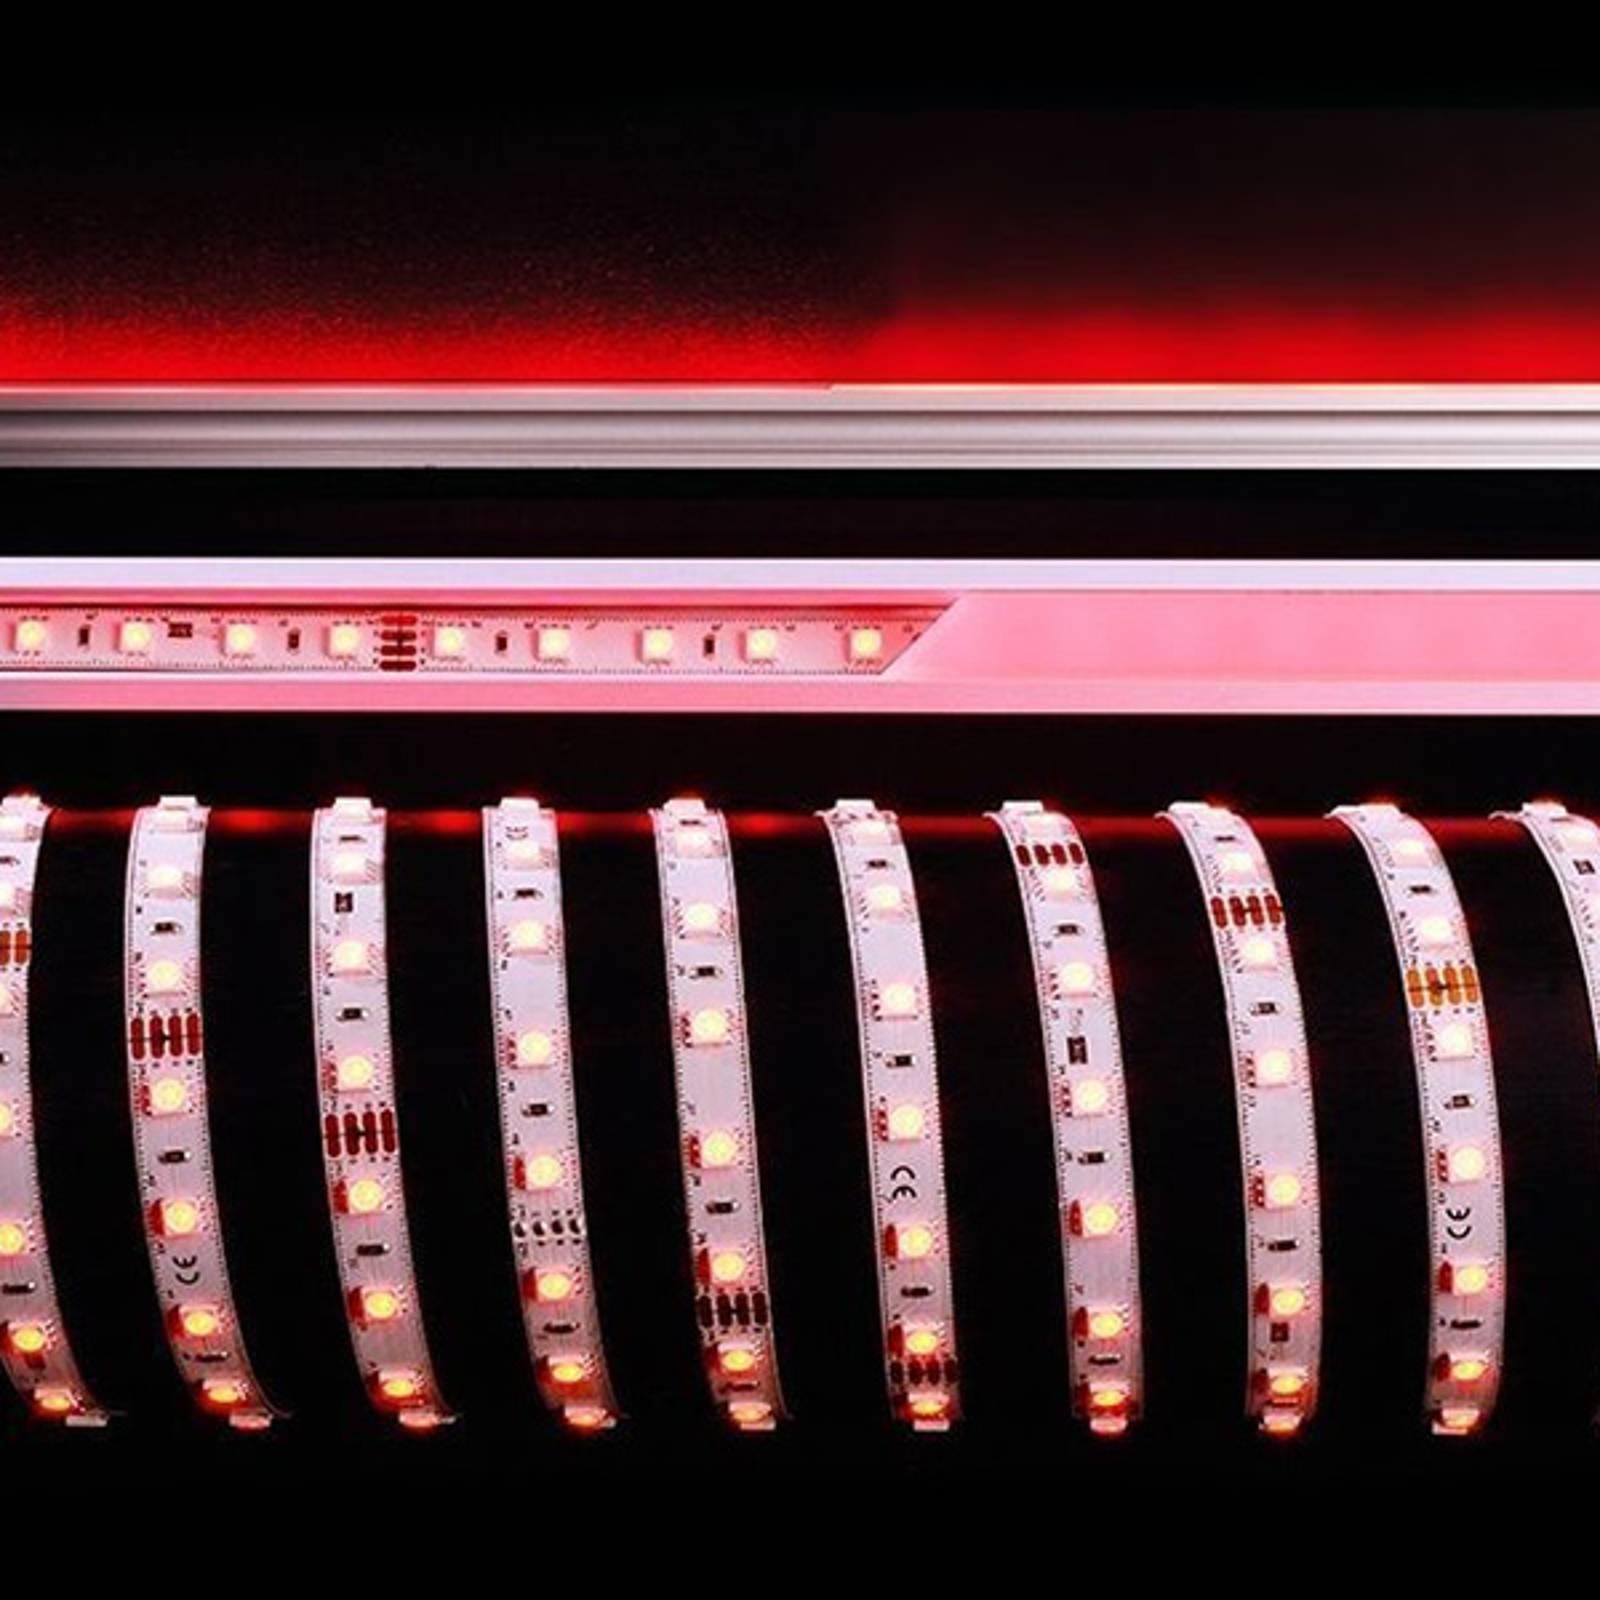 Strip LED flessibile IP67 5 m 450-630 nm 60 W